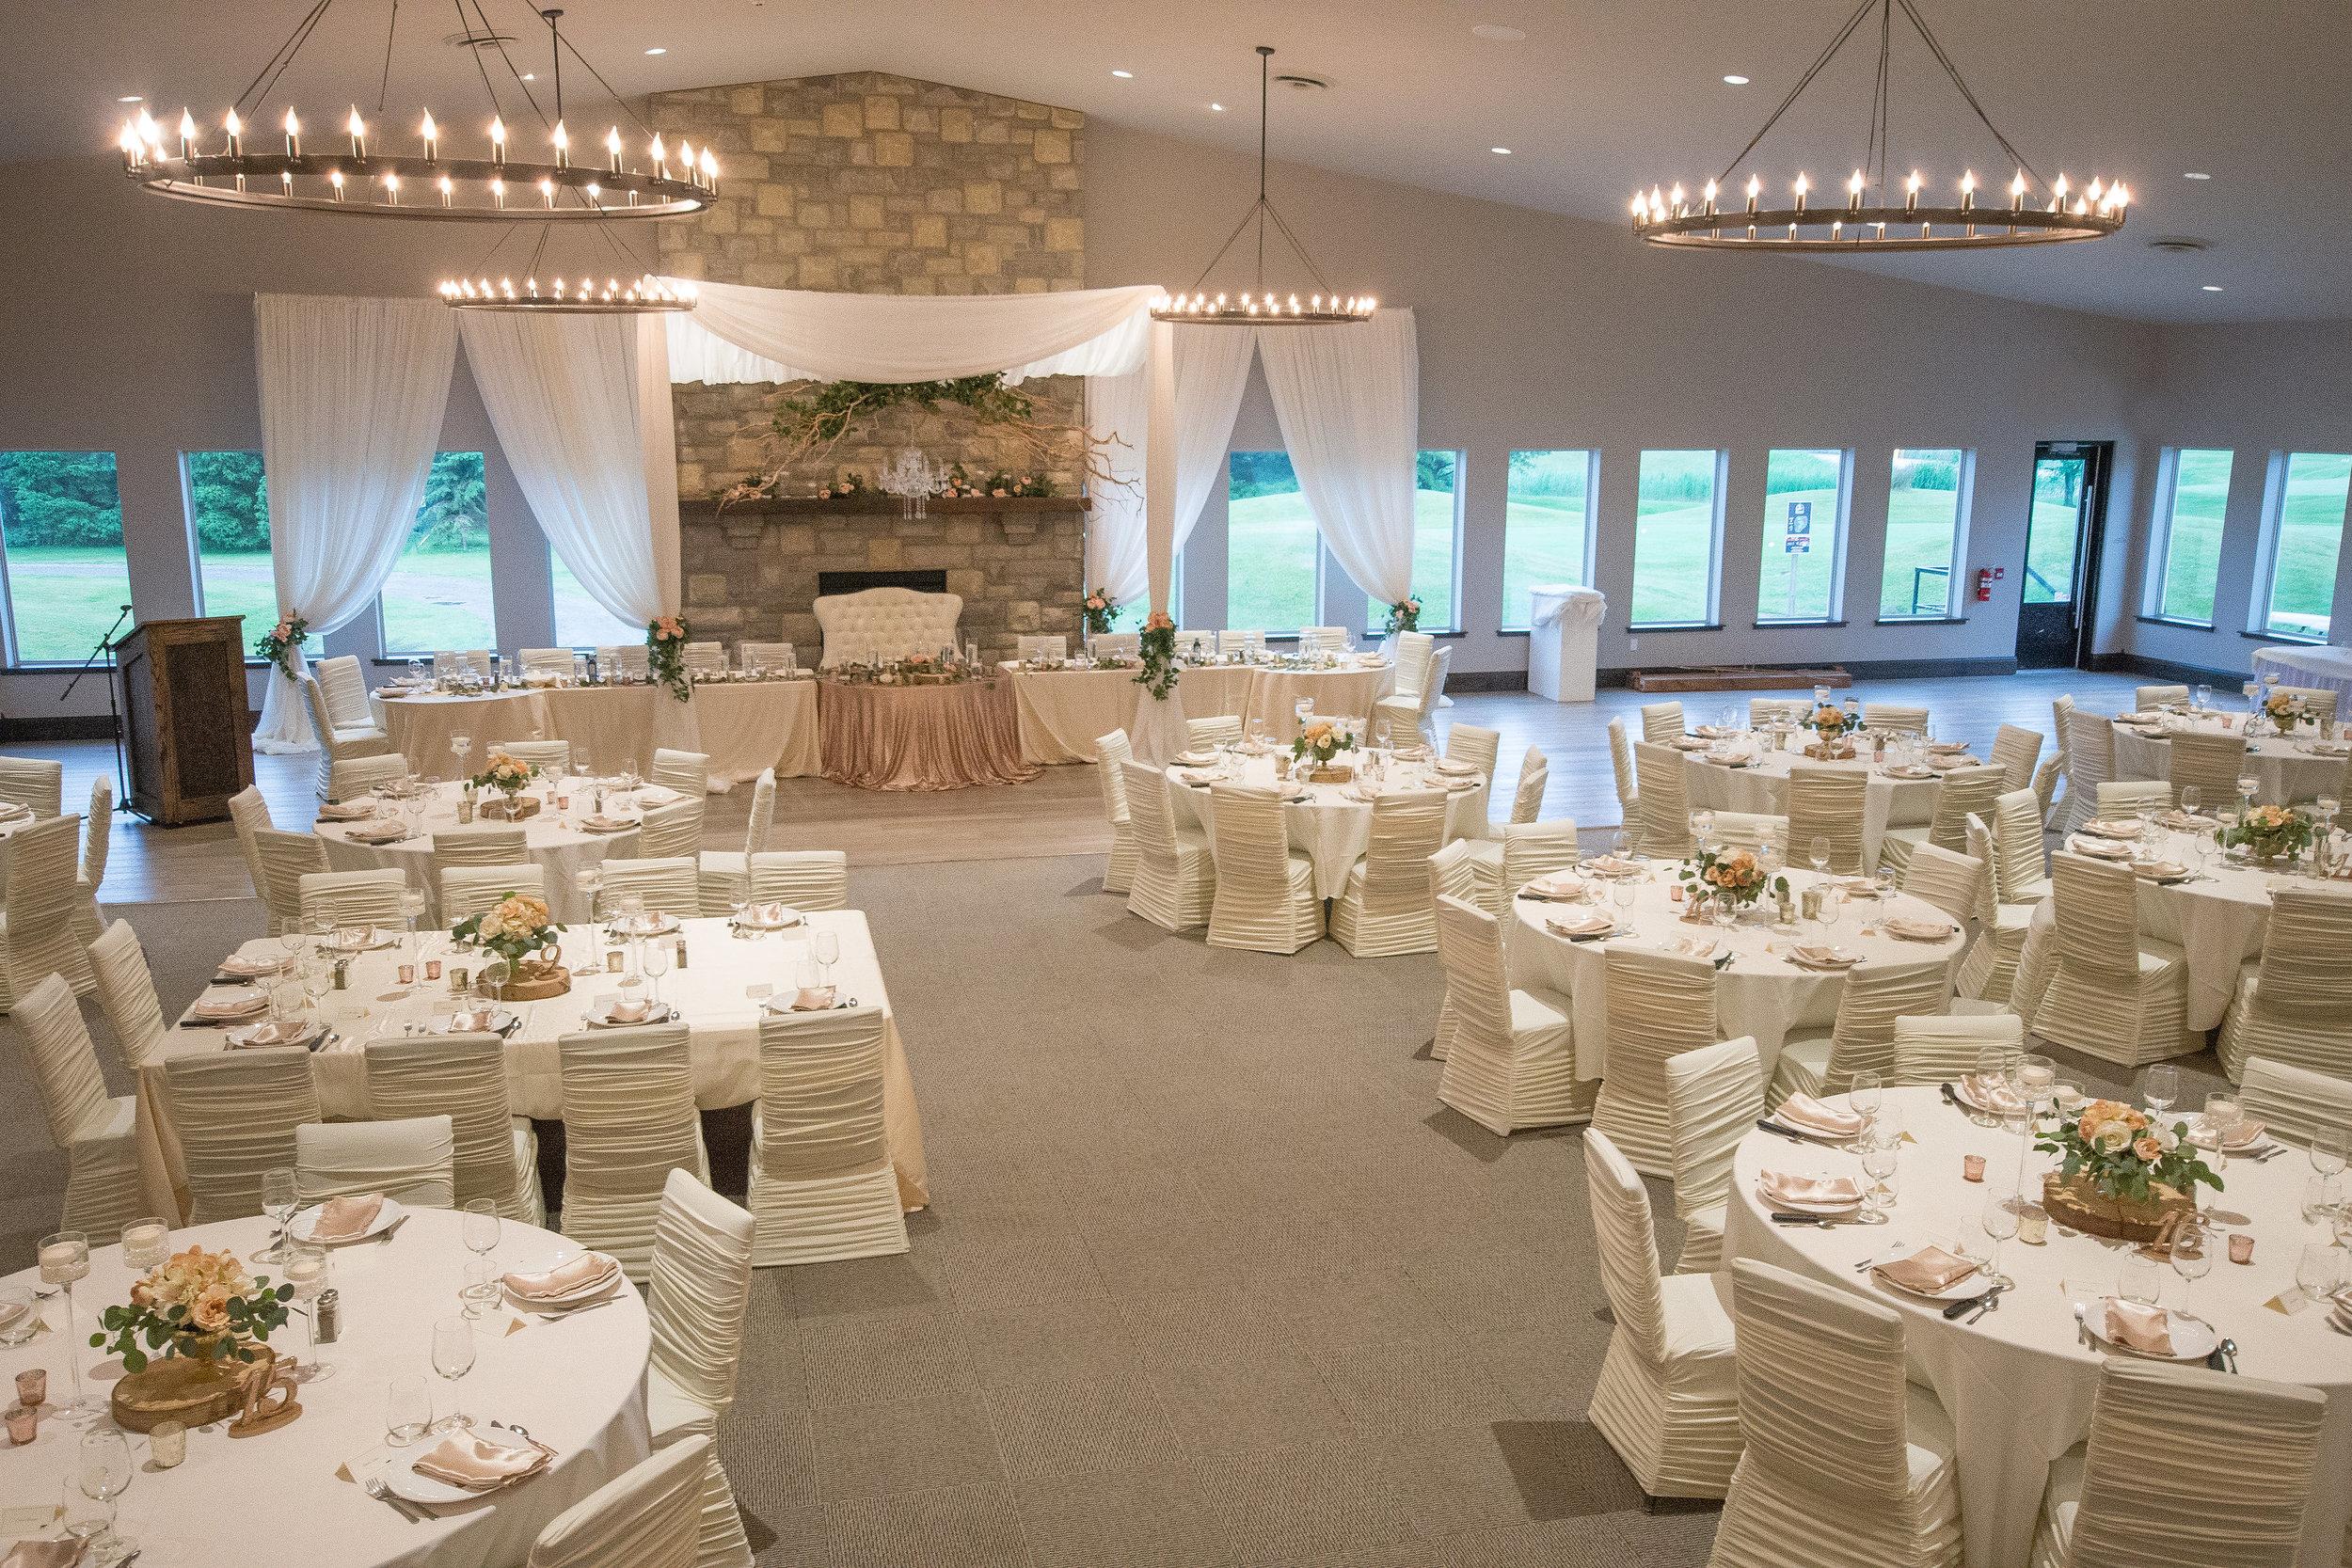 BanquetRoom-1.jpg